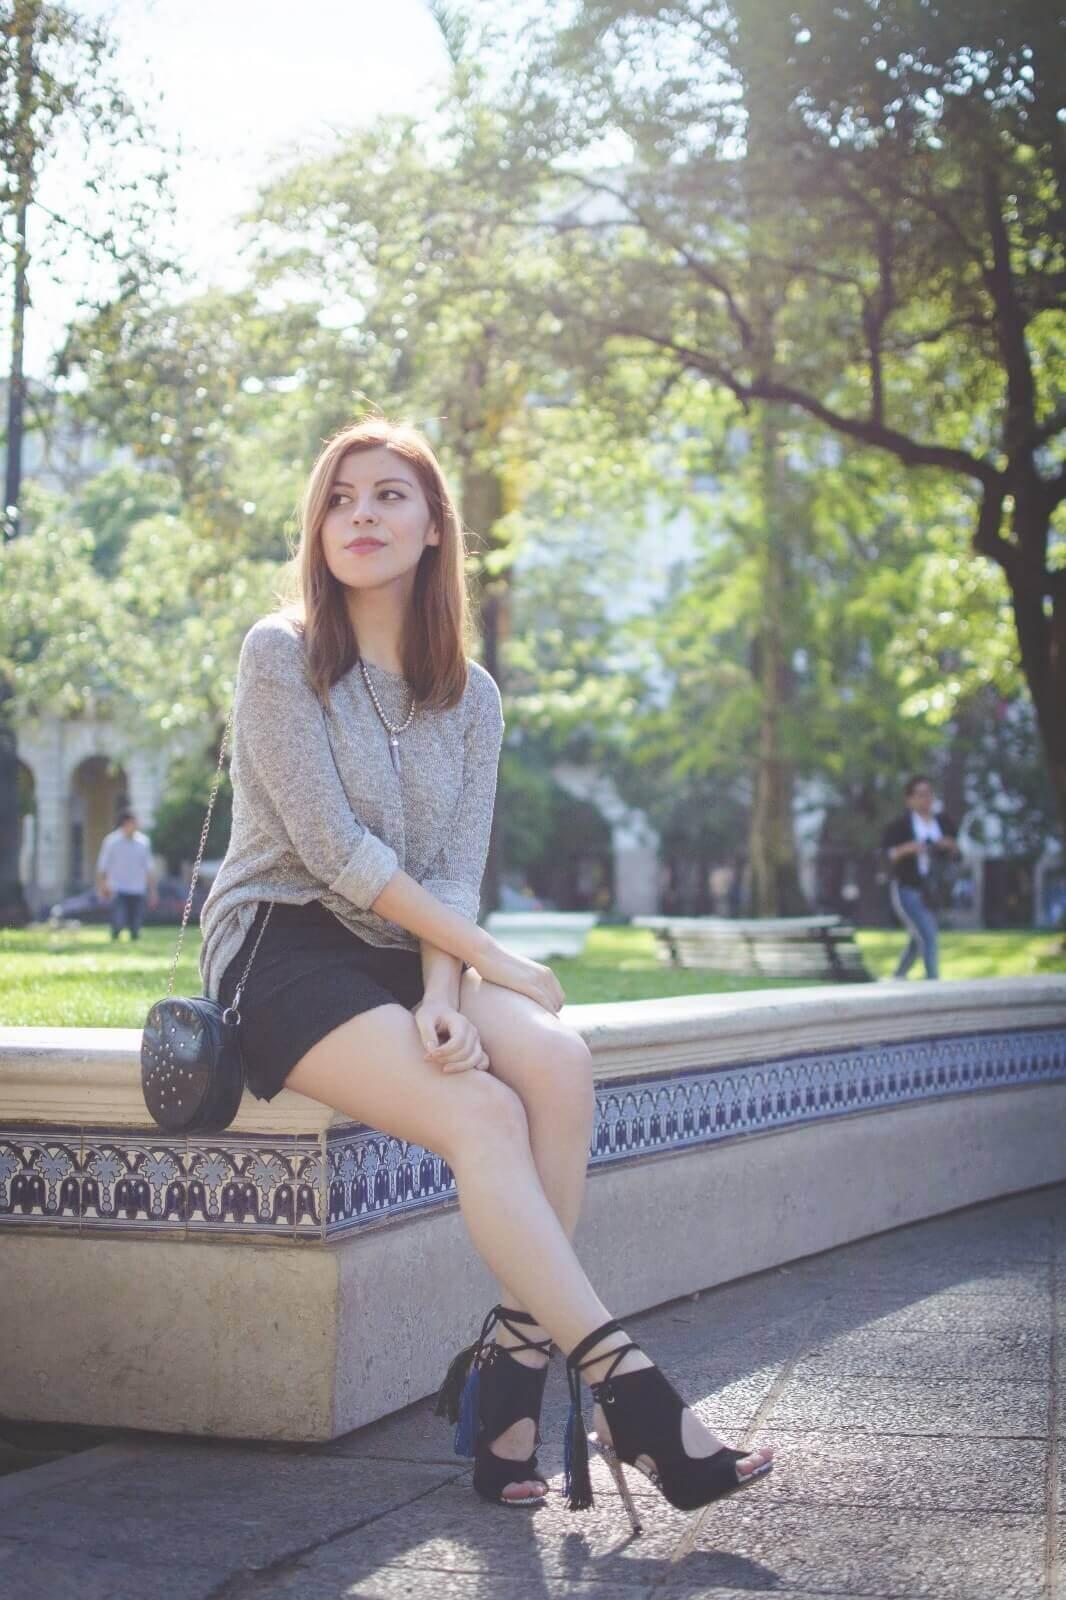 zaful-statement-shoes-silver-mirrored-sunglasses-deborah-ferrero-streetstyle-style-by-deb14